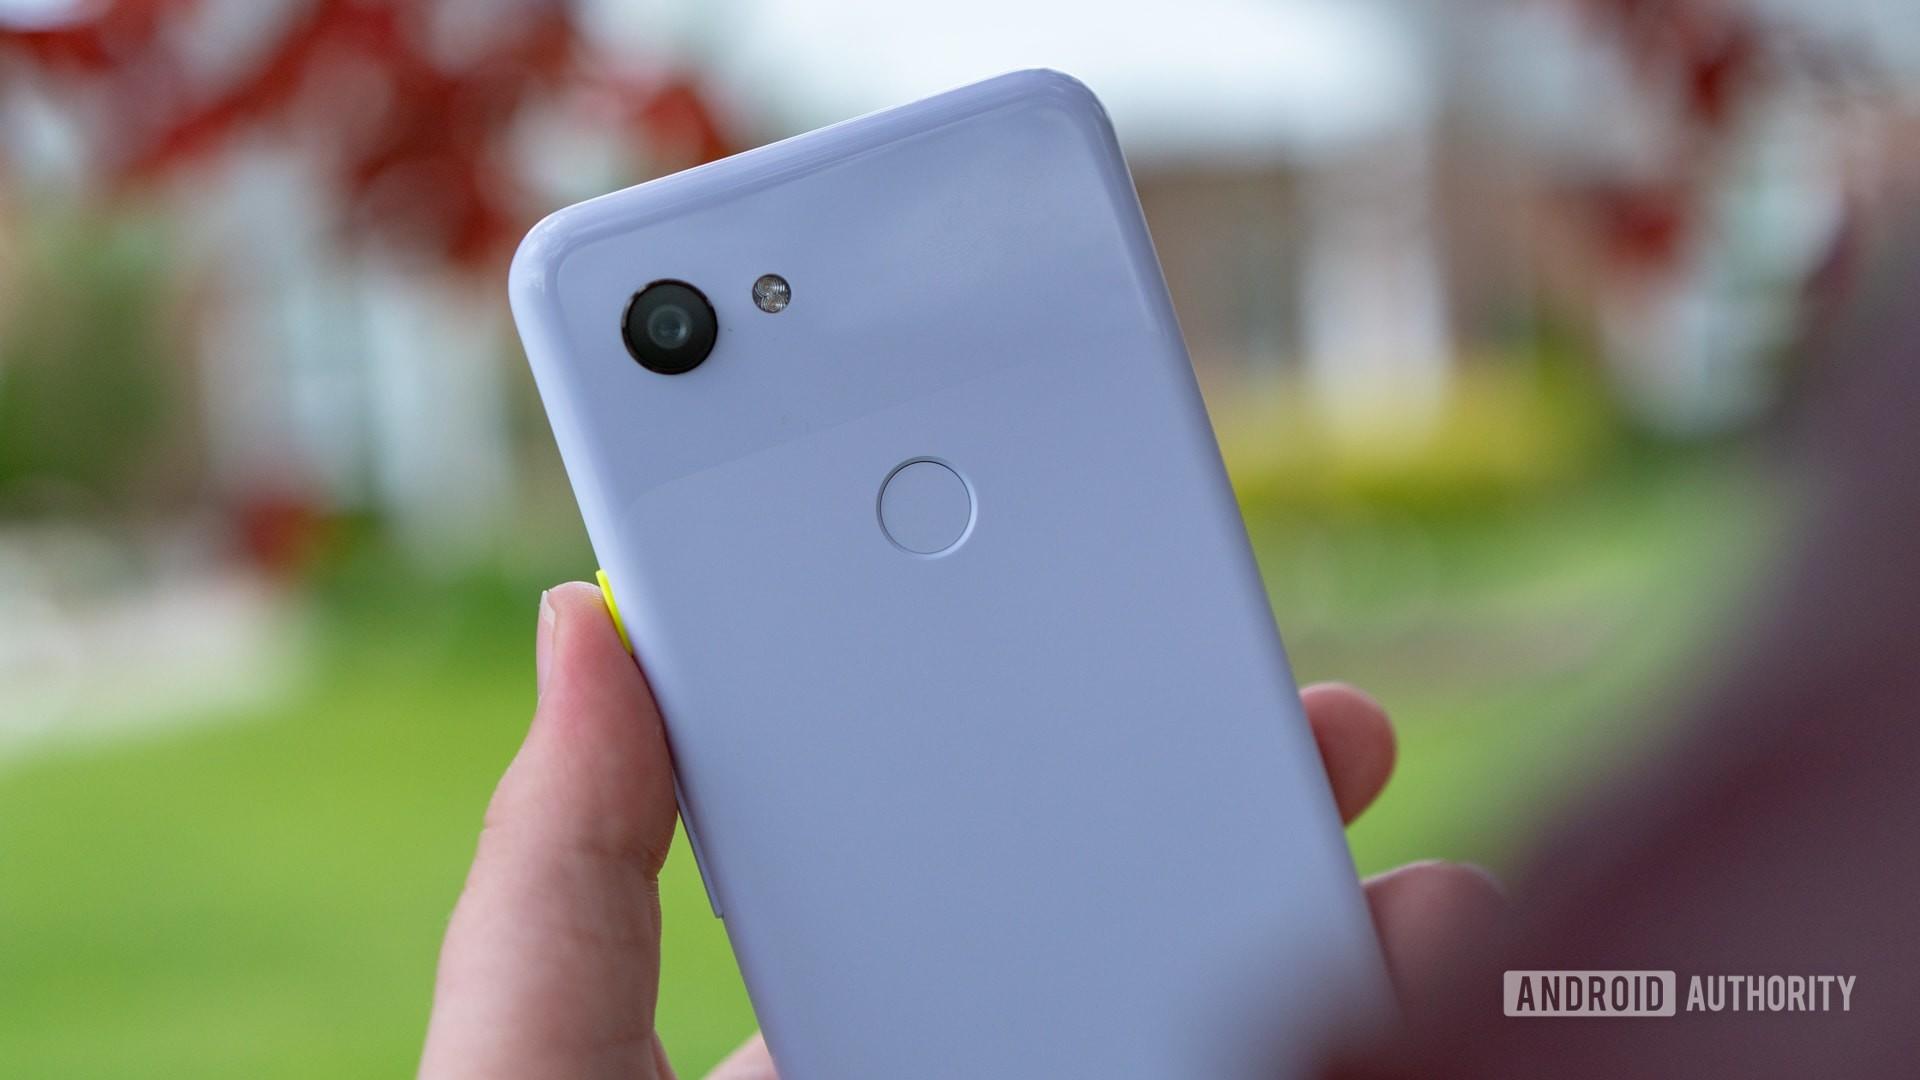 Google Pixel 3a camera quality close to Google Pixel 3